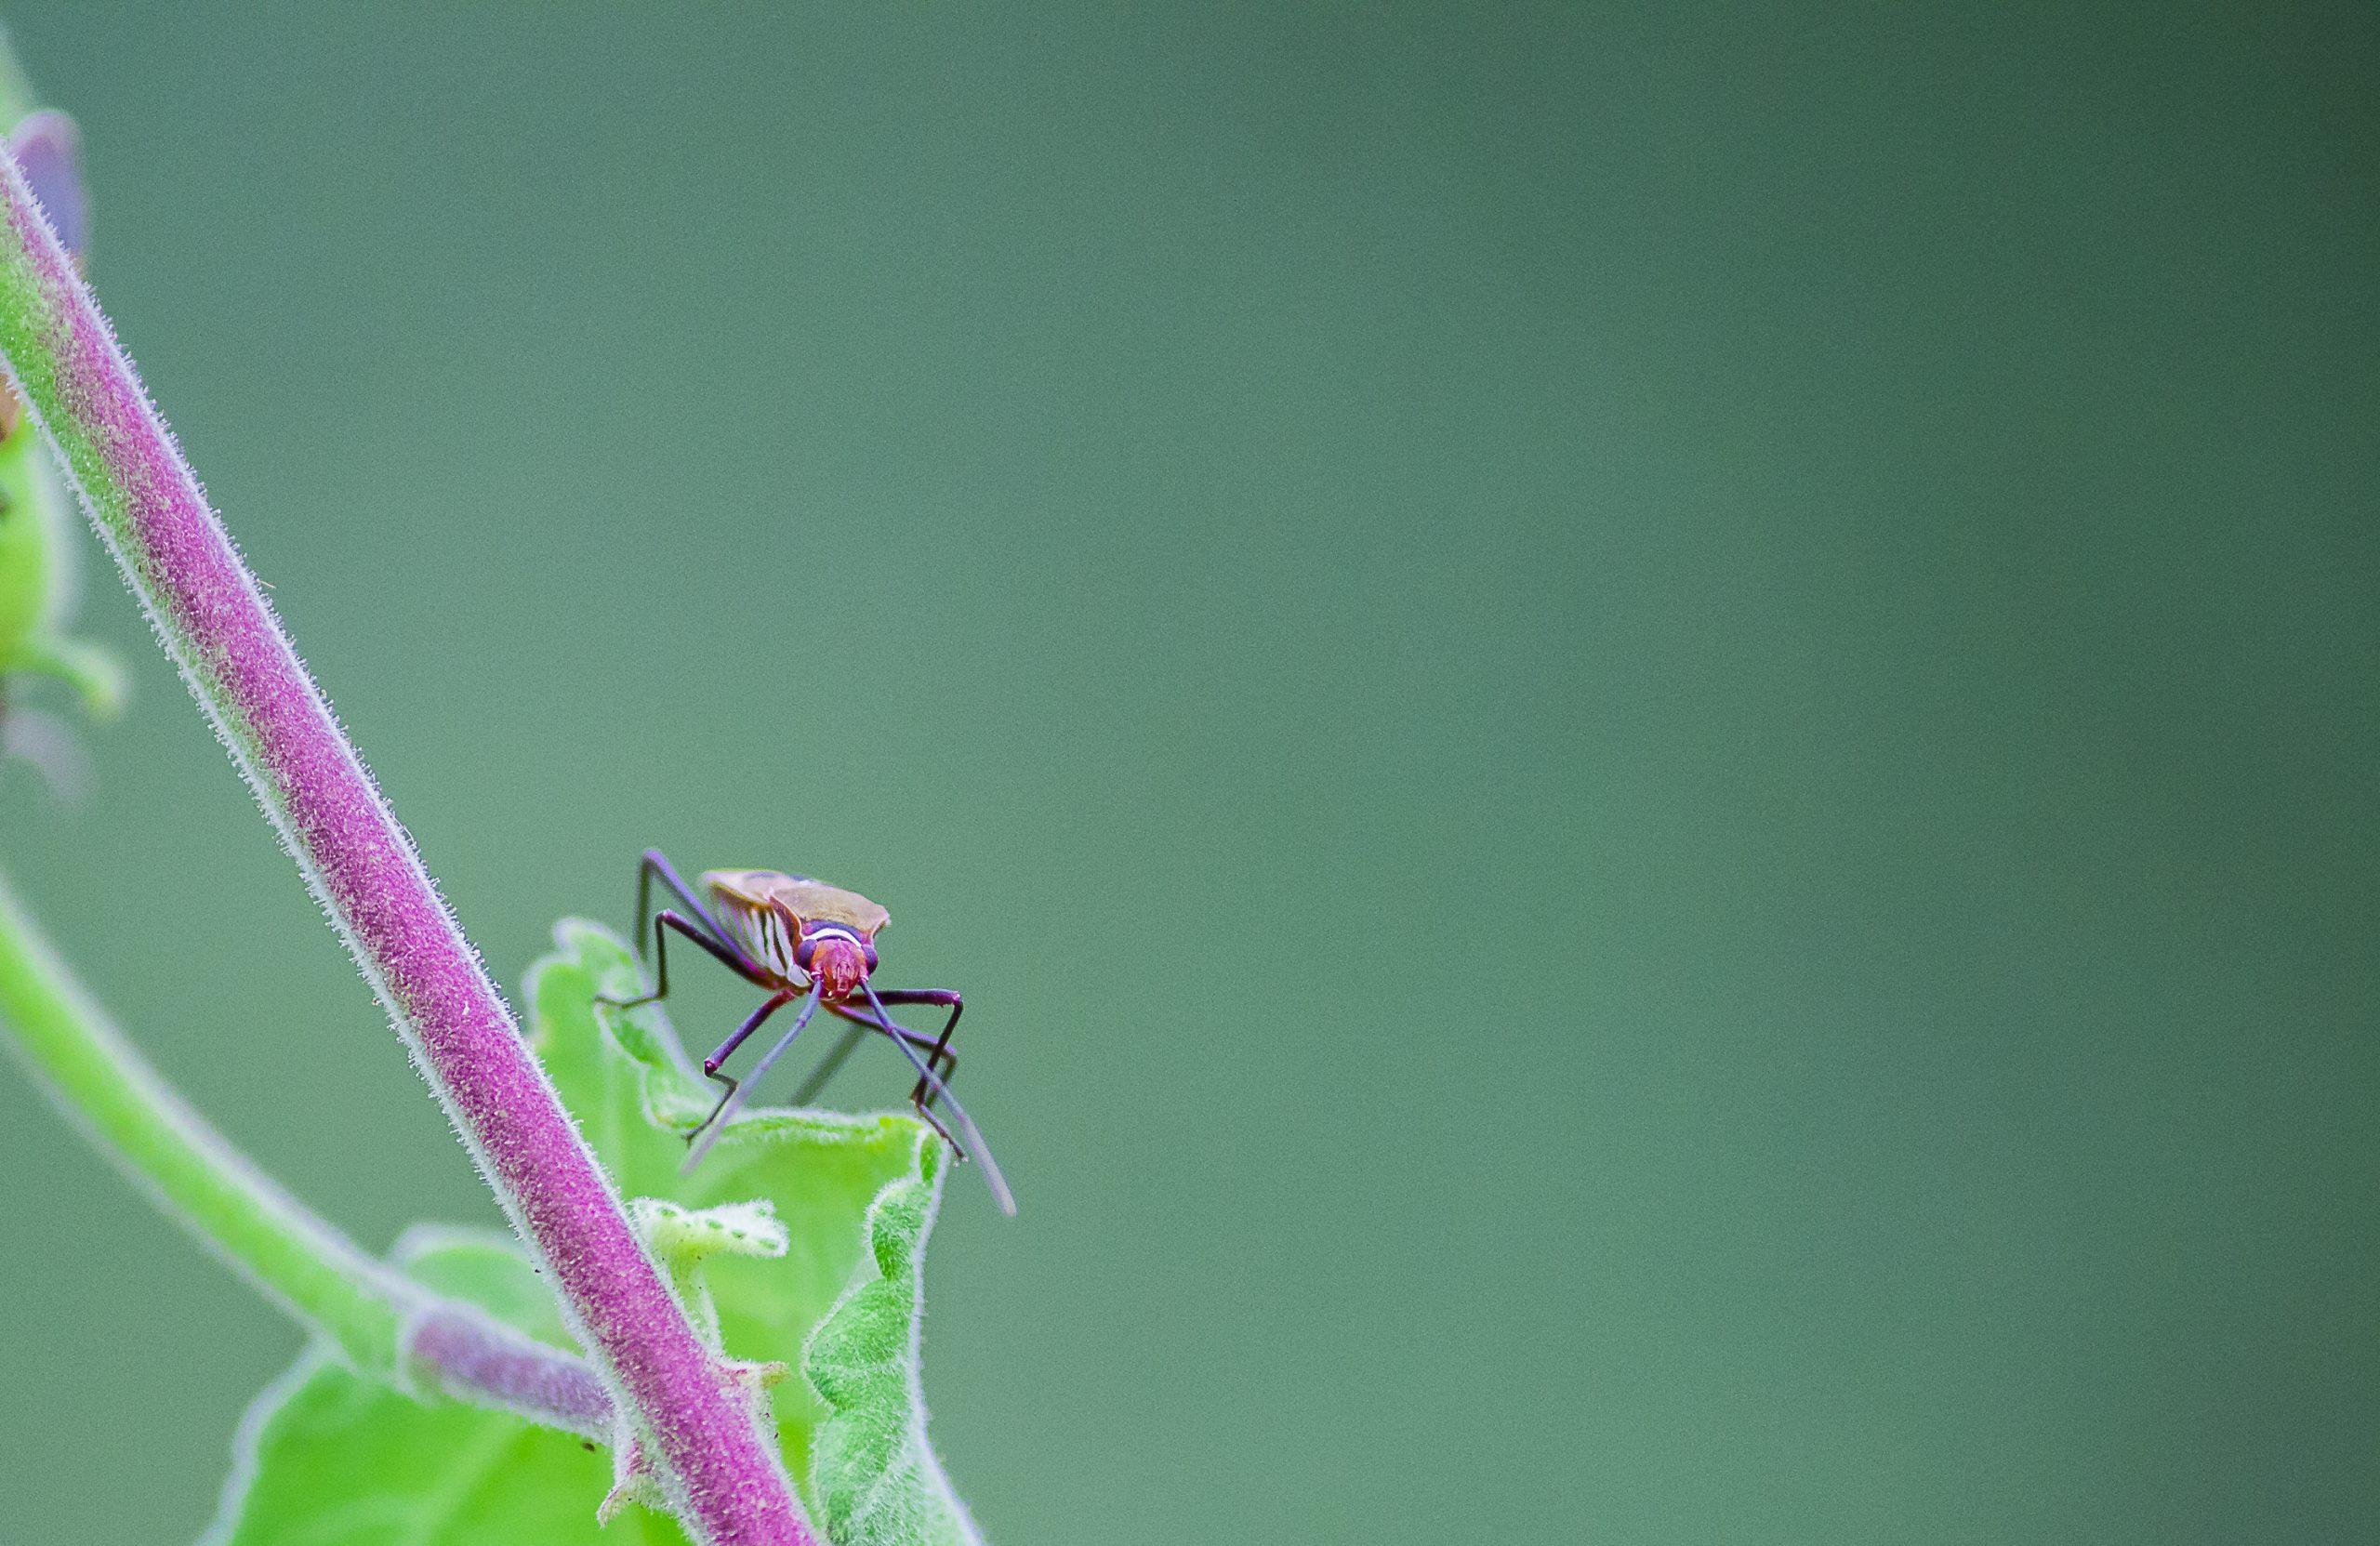 Stink Bug on a Plant Stem